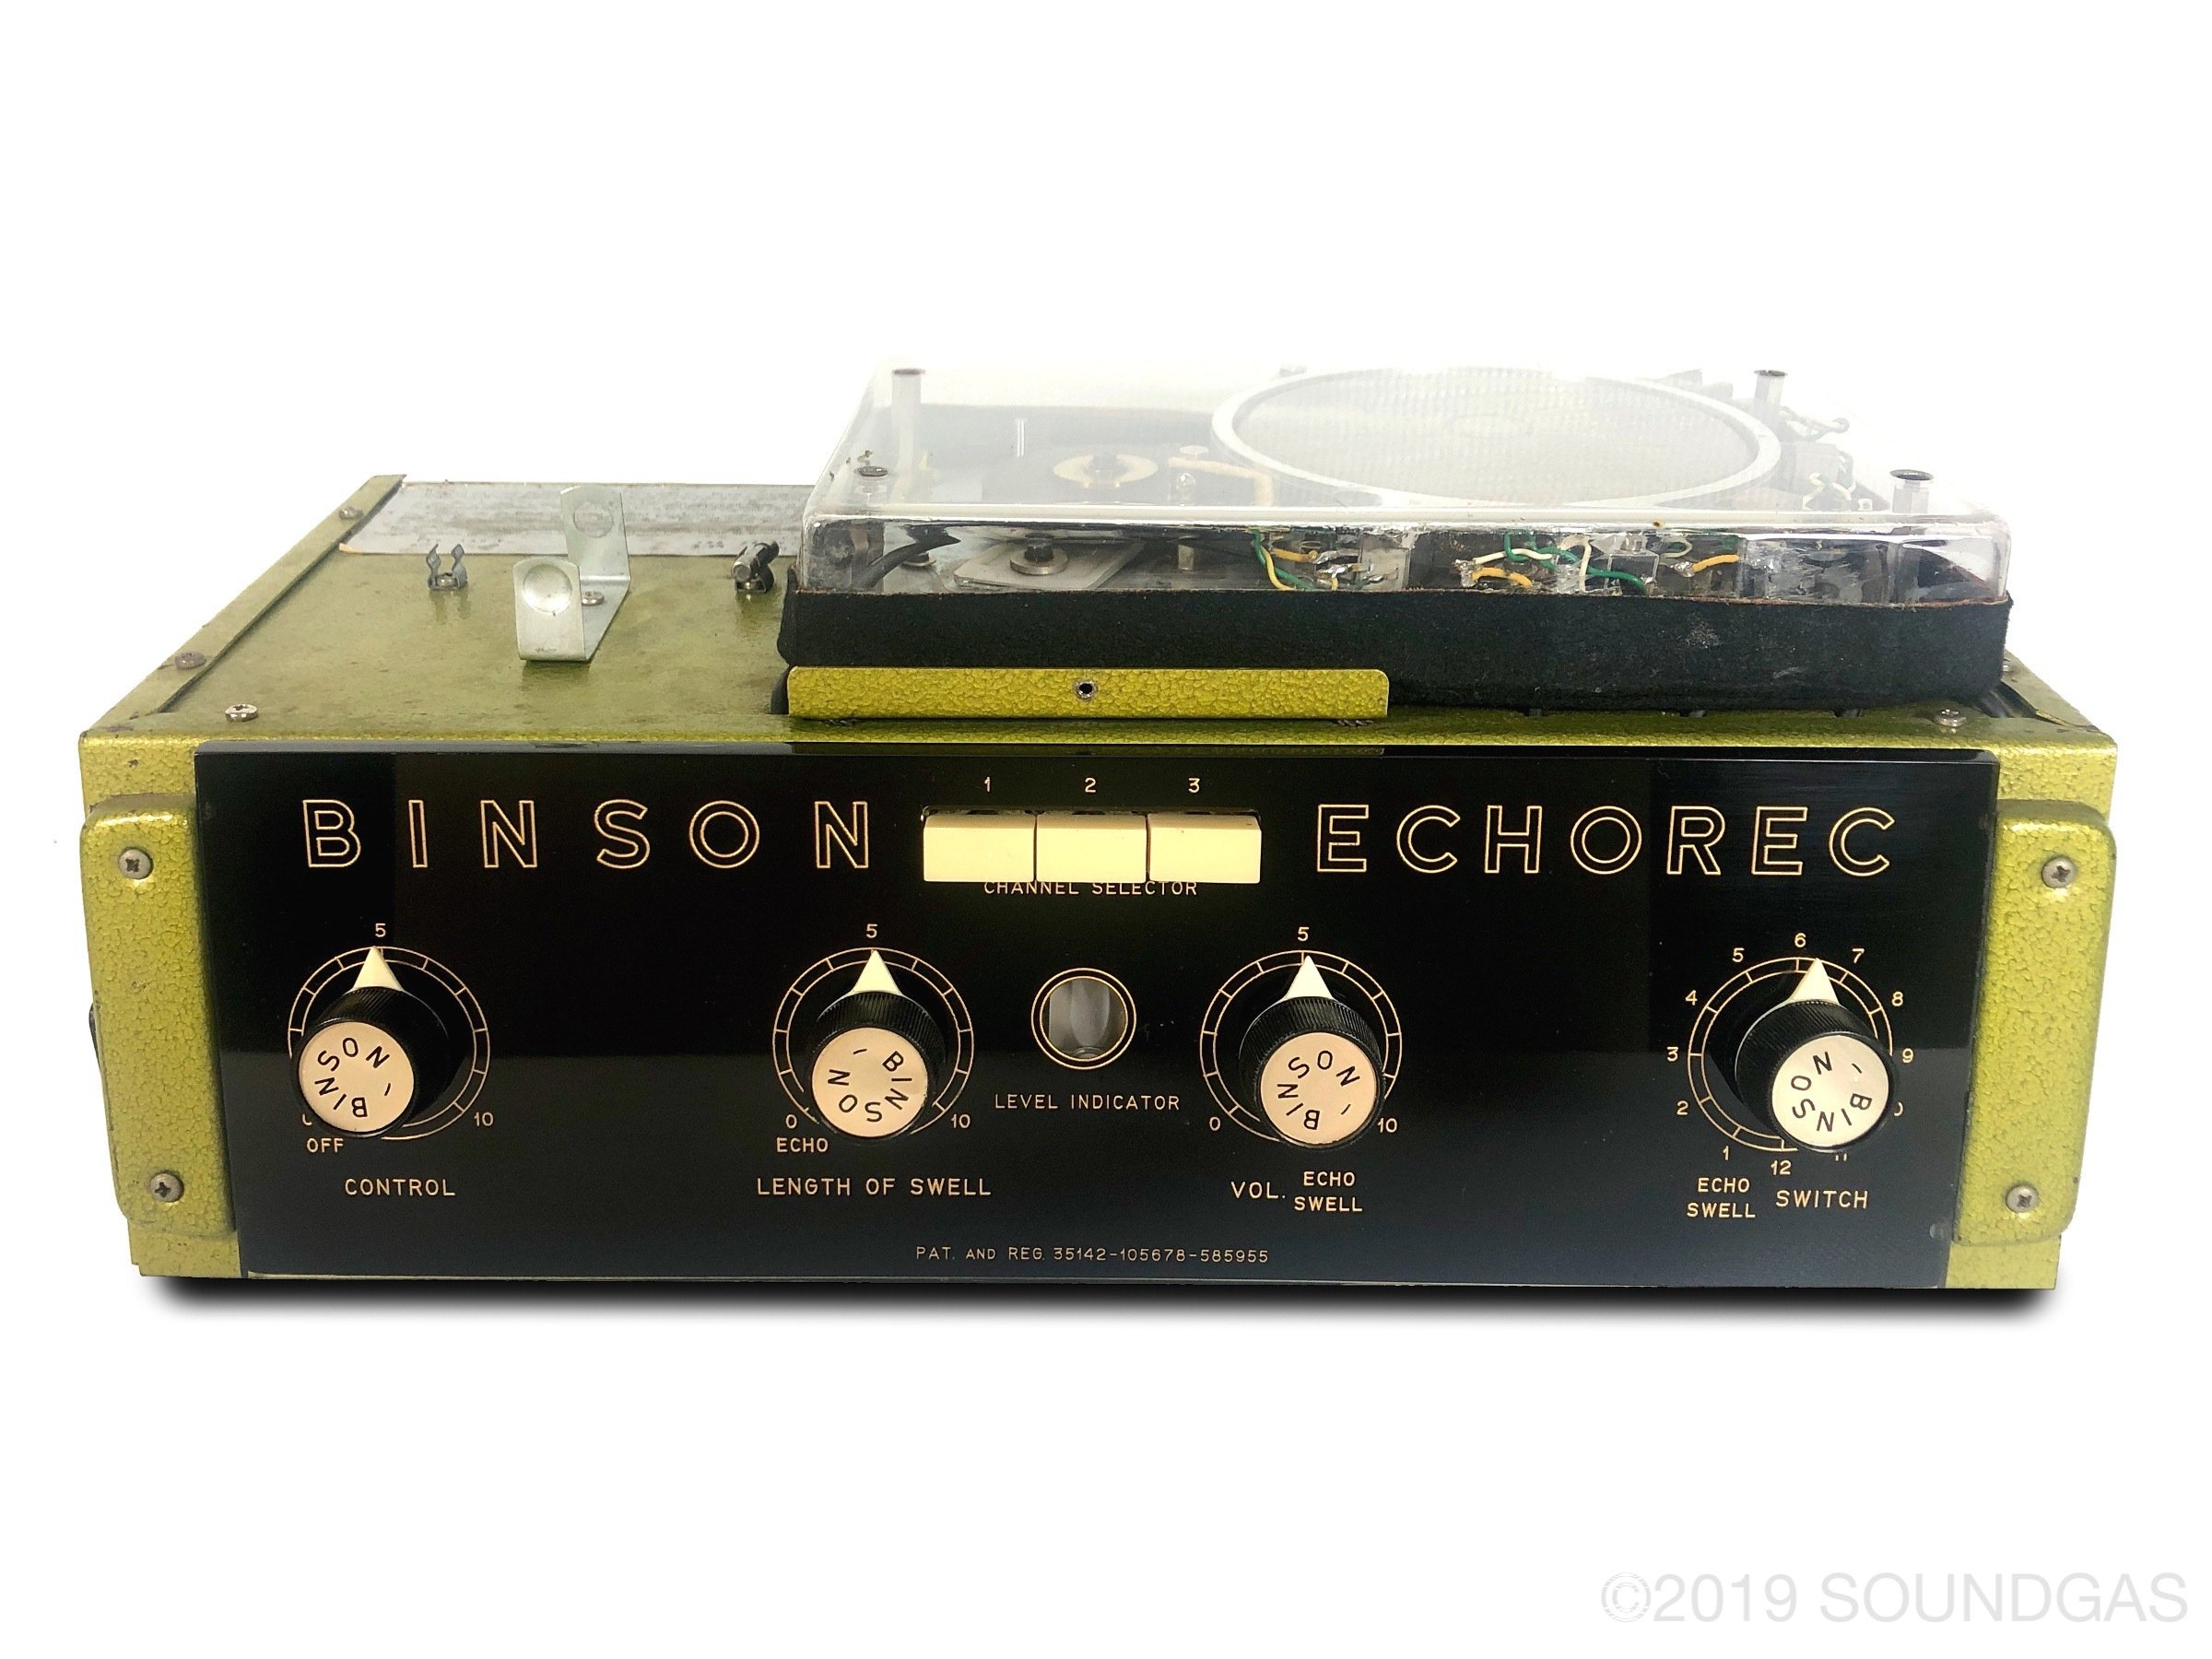 Binson Echorec B2 (Baby 2) Varispeed + Wet-Only Output - Pre-Order